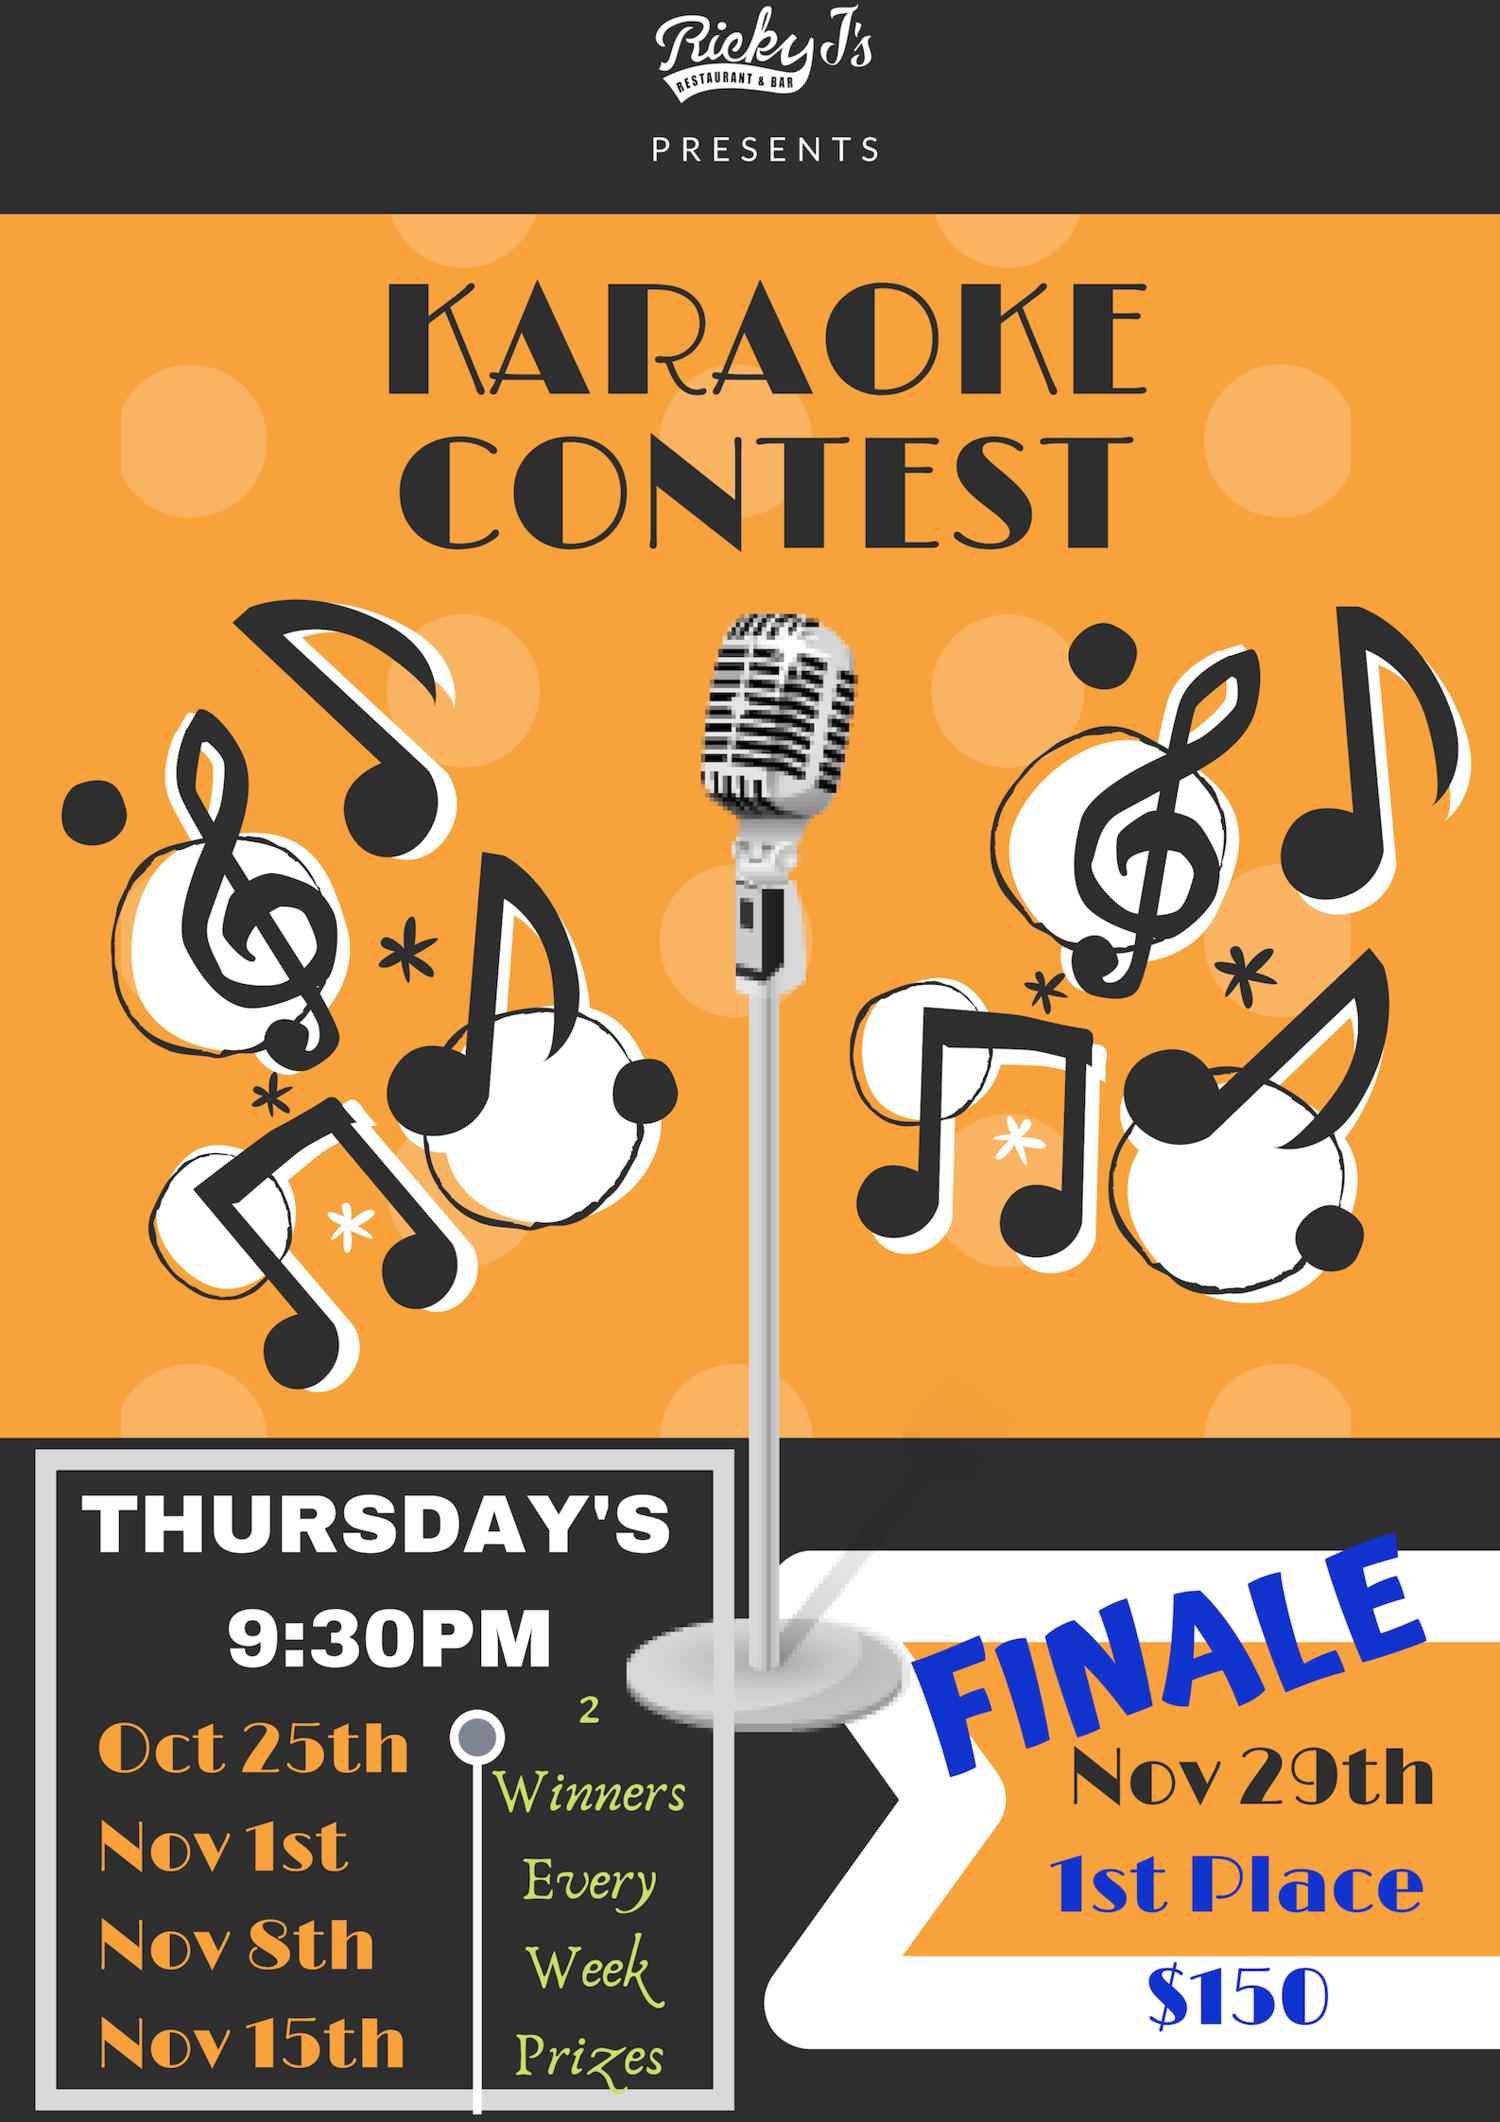 Karaoke clipart karaoke contest, Karaoke karaoke contest ...